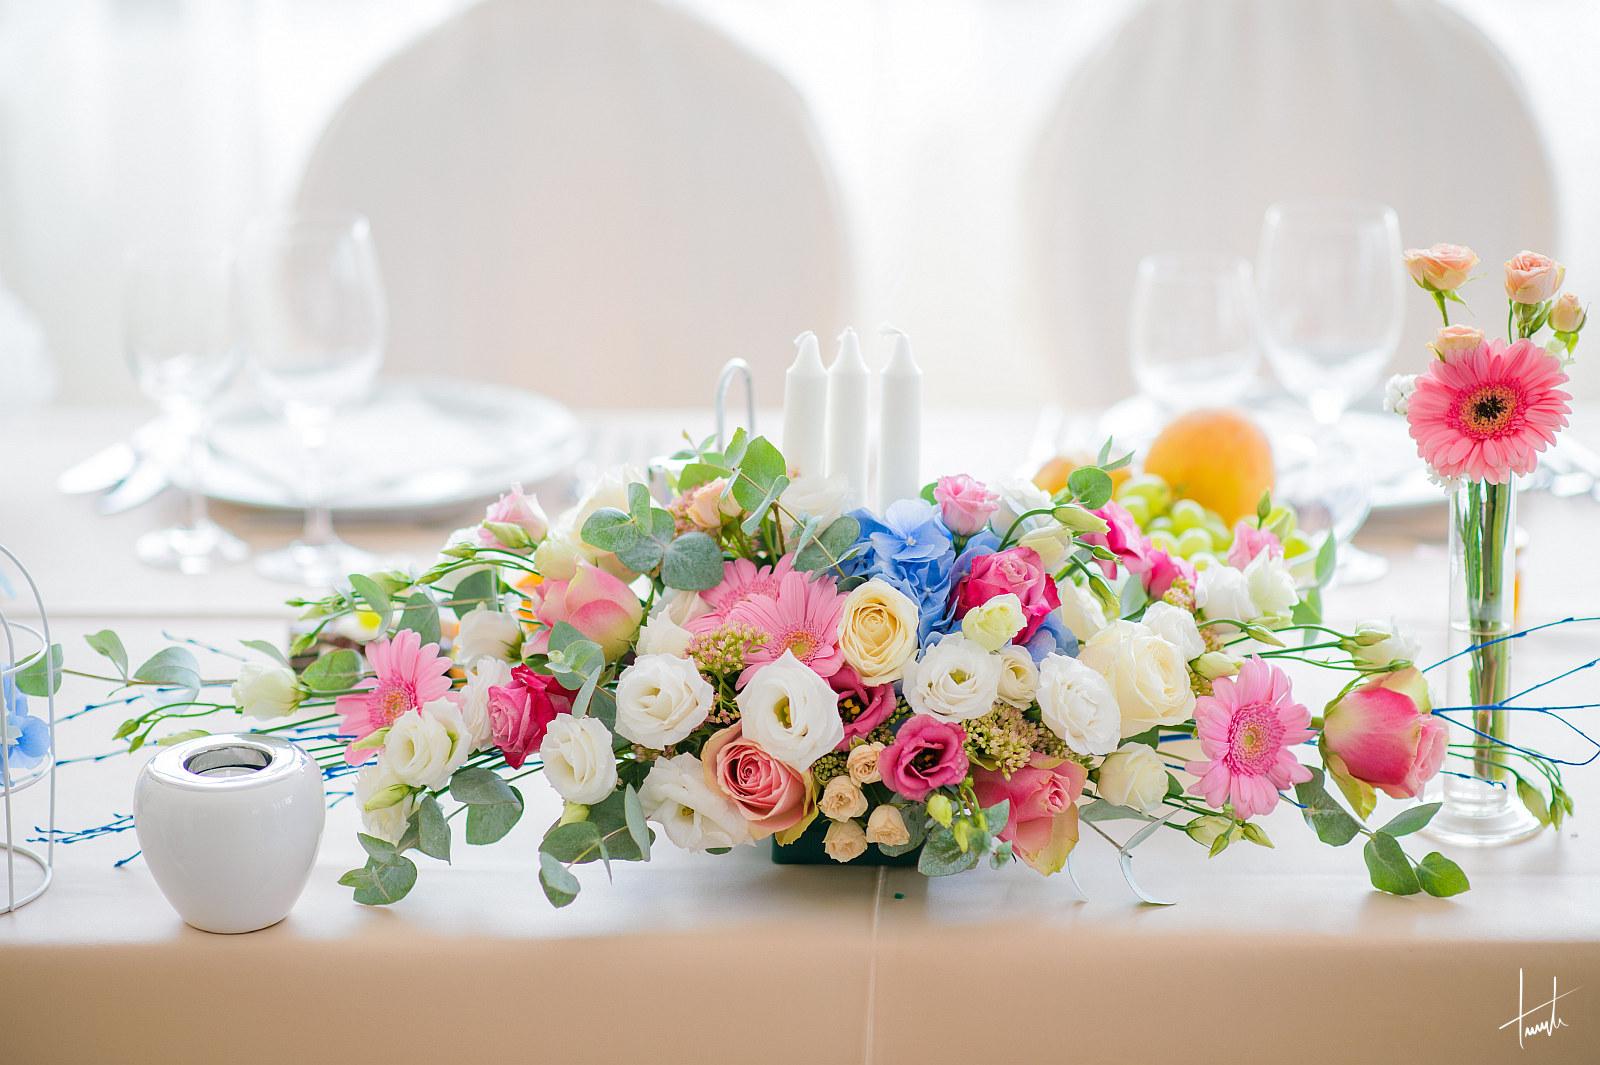 fotografie de nunta - Martha Ionut 18